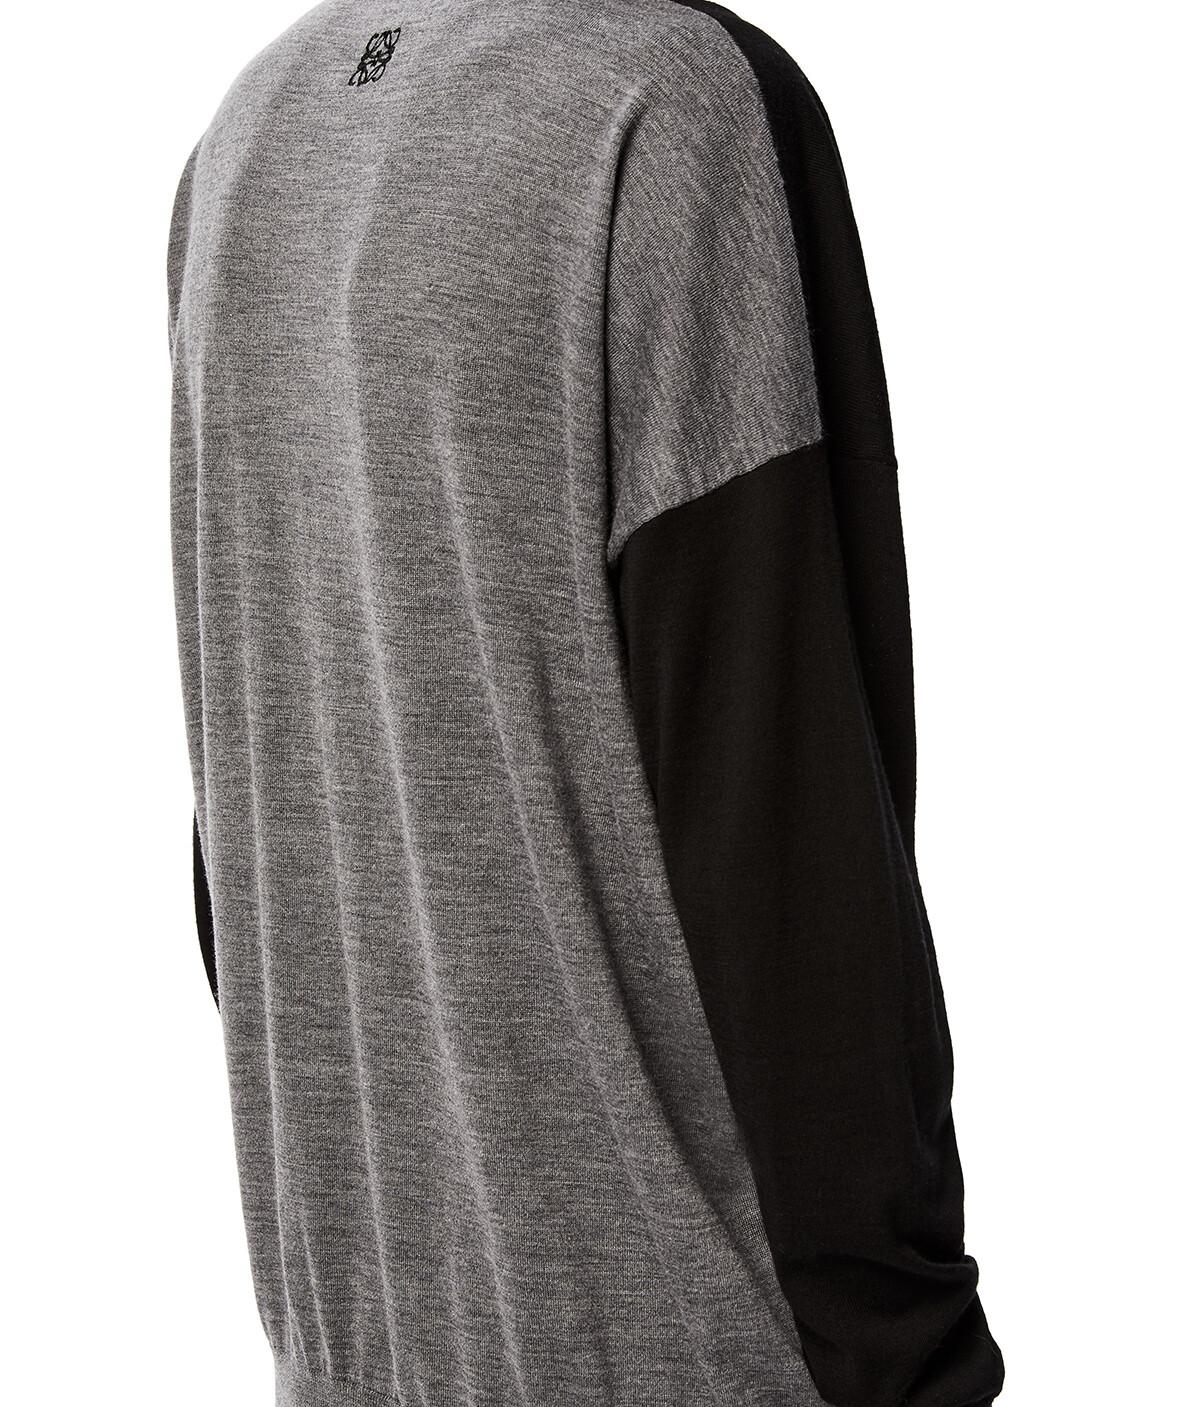 LOEWE Anagram Sweater Negro/Gris front